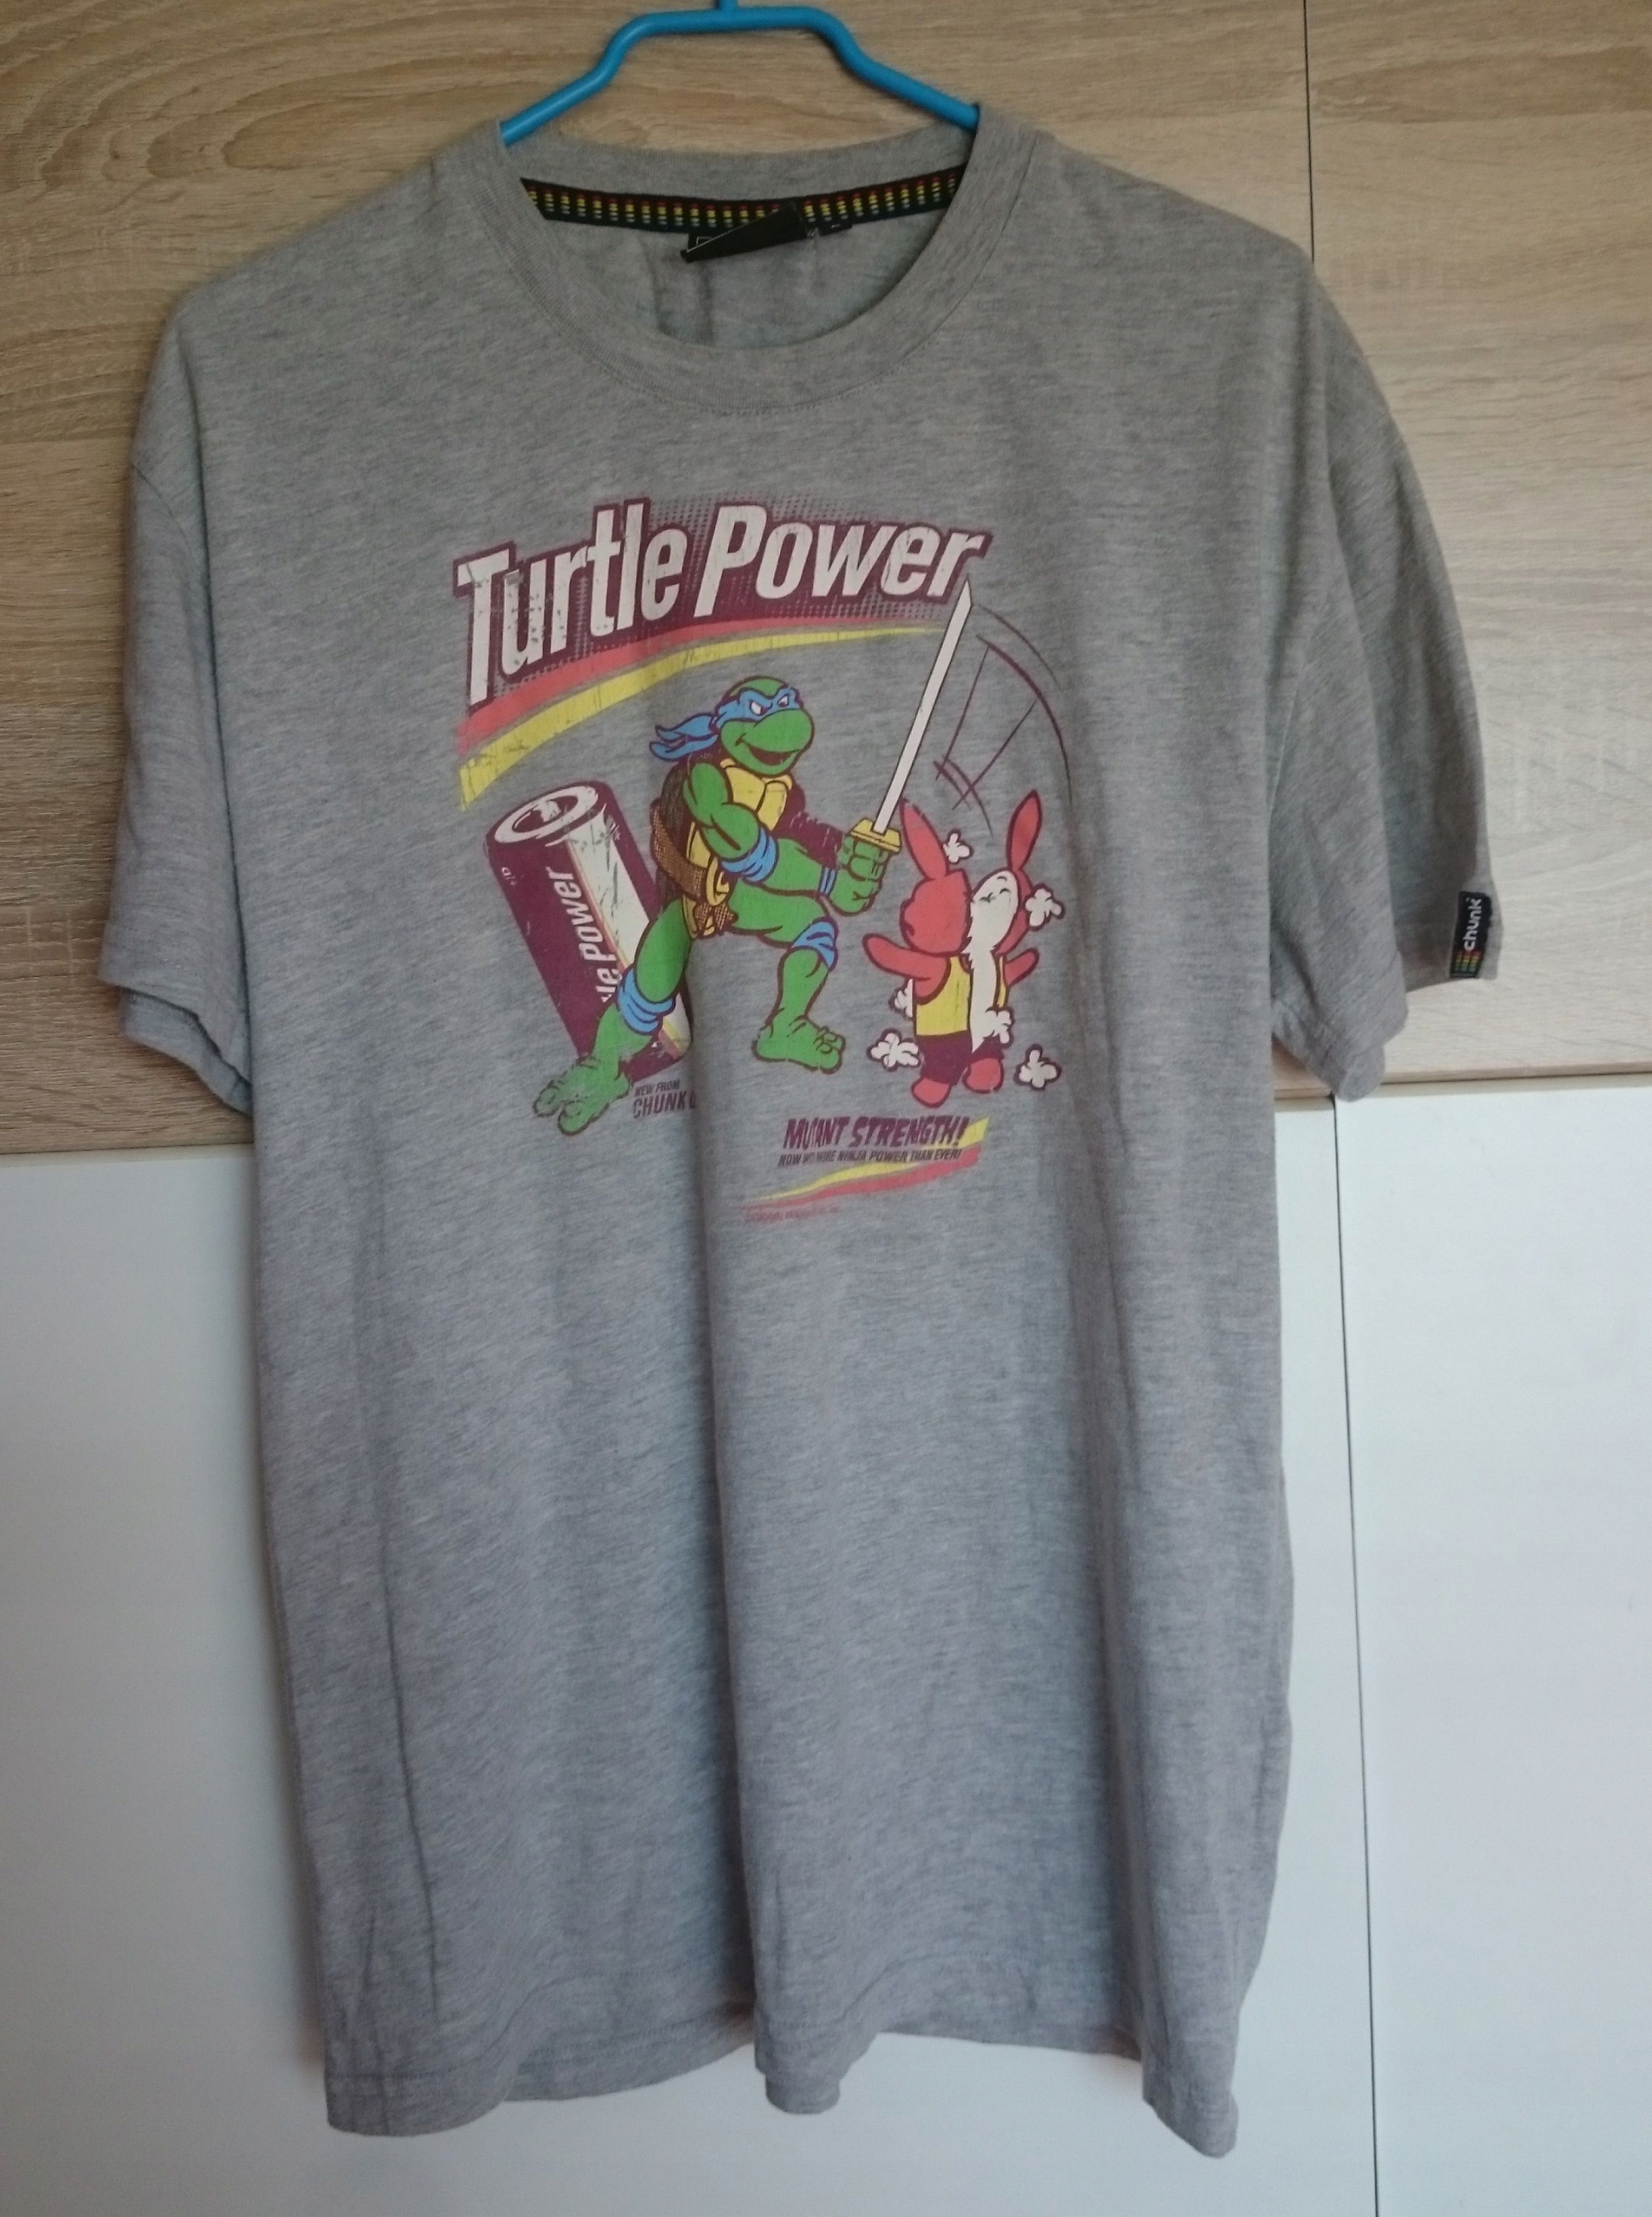 KOSZULKA turtles power t-shirt Żółwie ninja